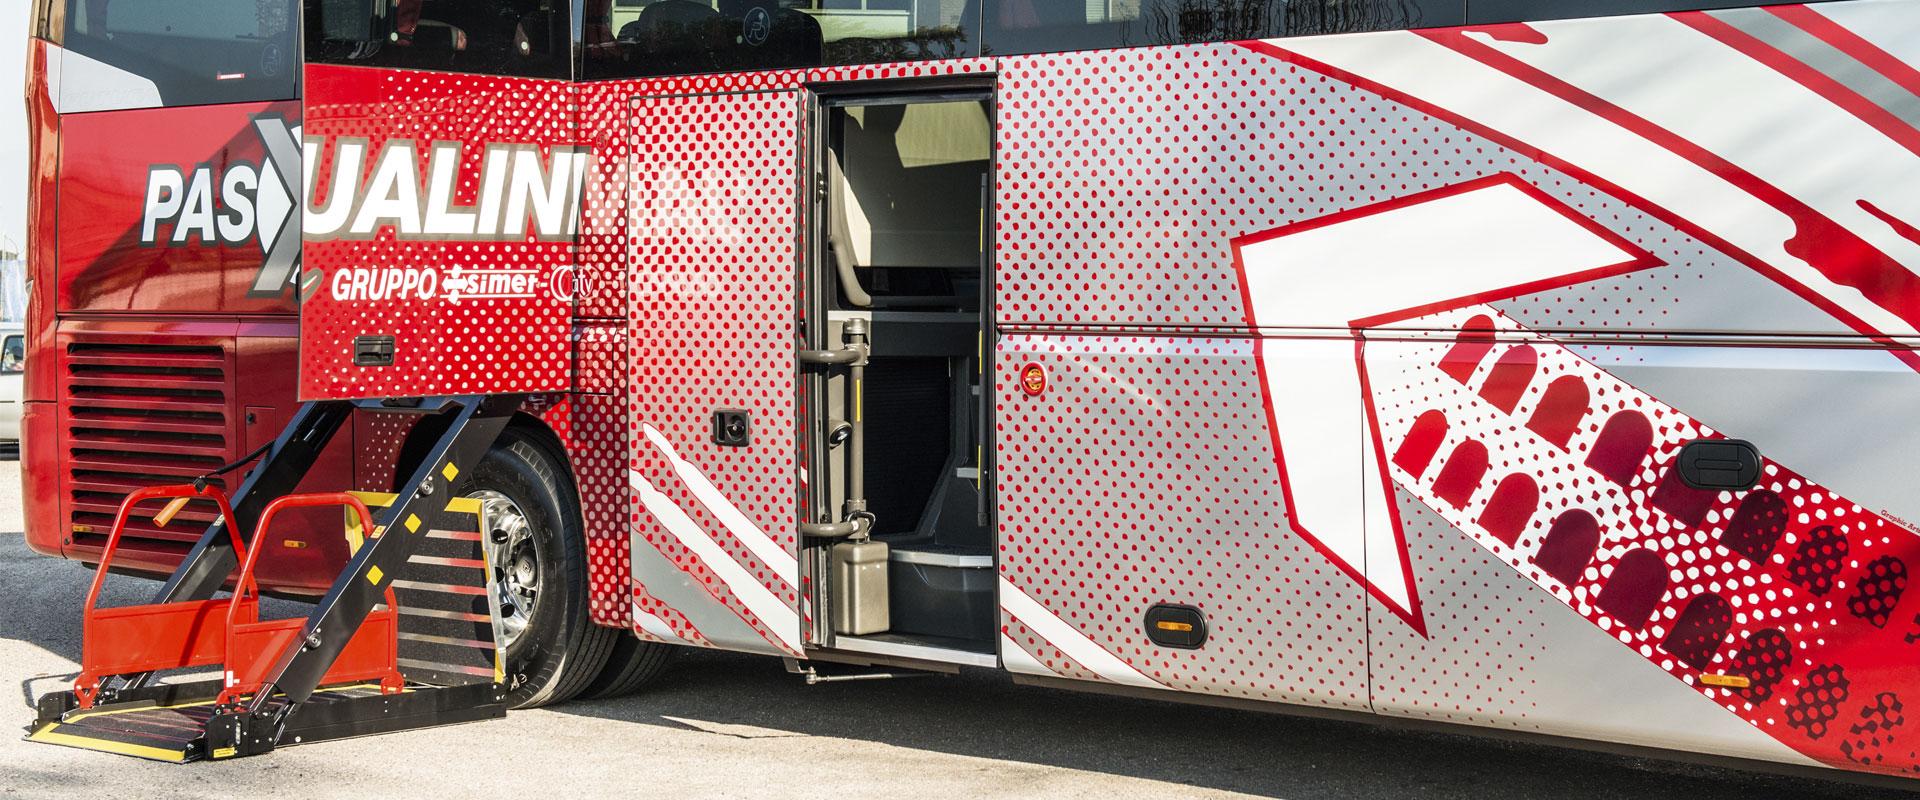 Vdl Futura Pasqualini Bus 8